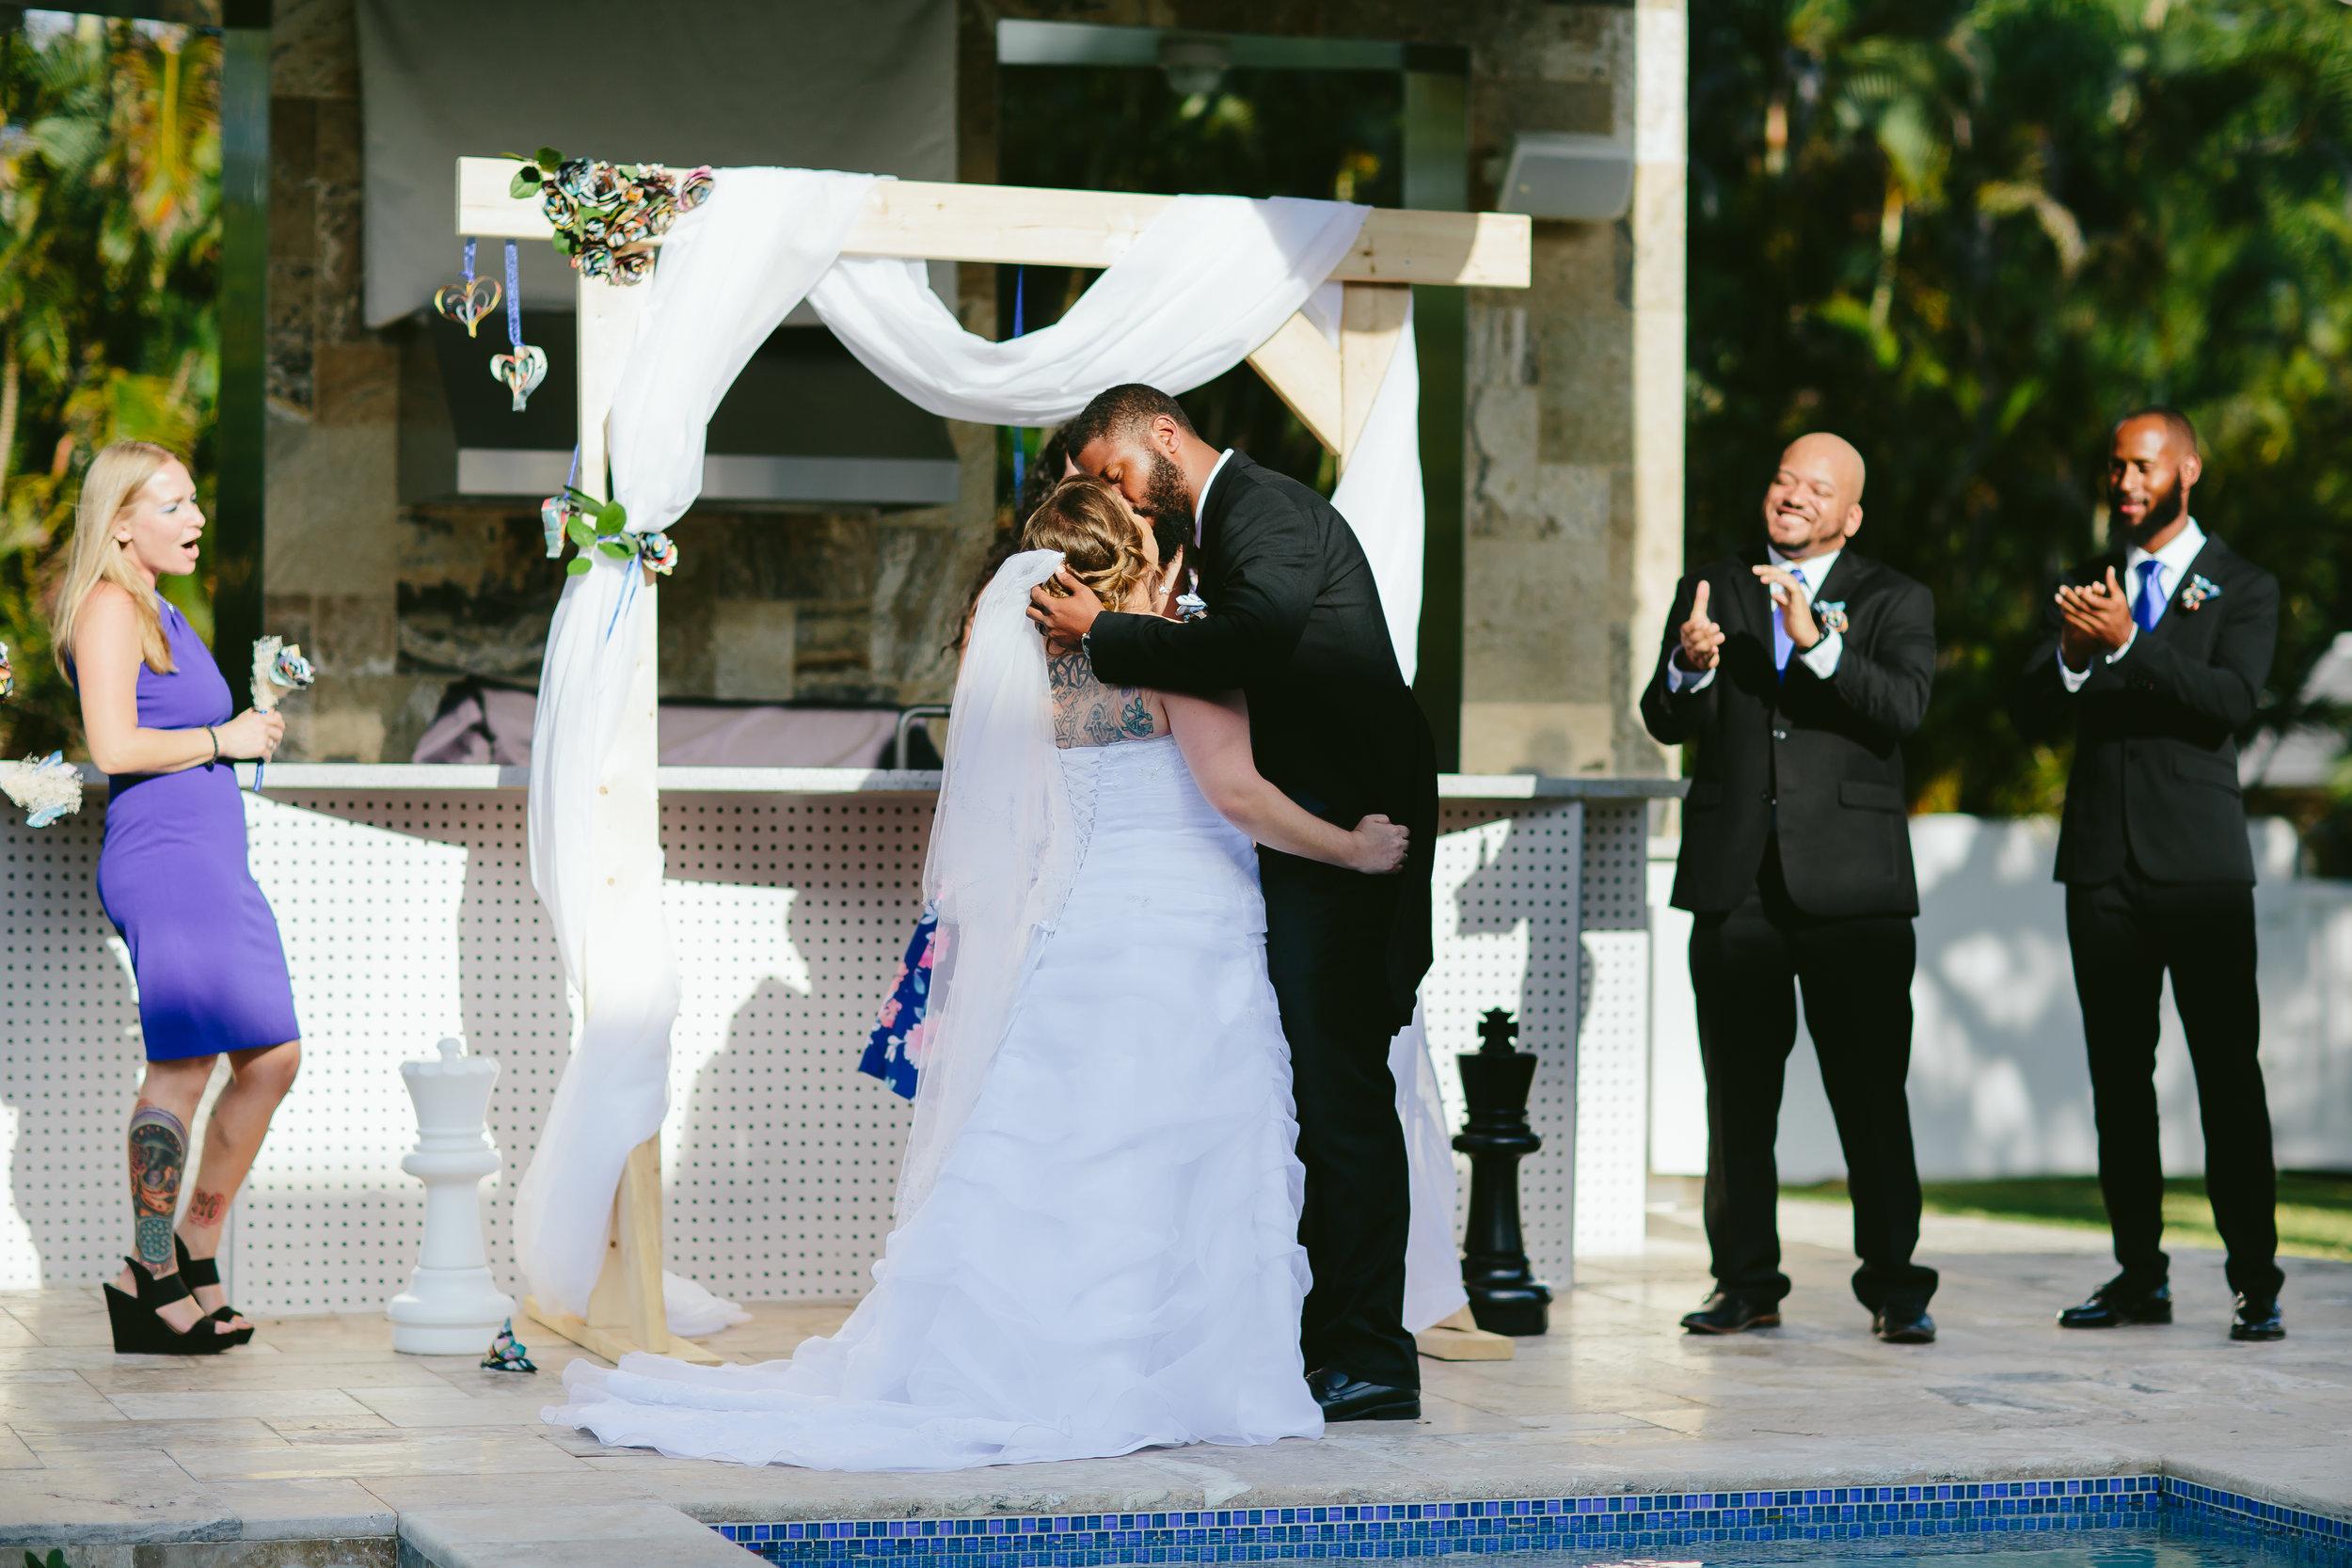 bride-groom-kiss-married-backyard-ceremony-diy-wedding.jpg